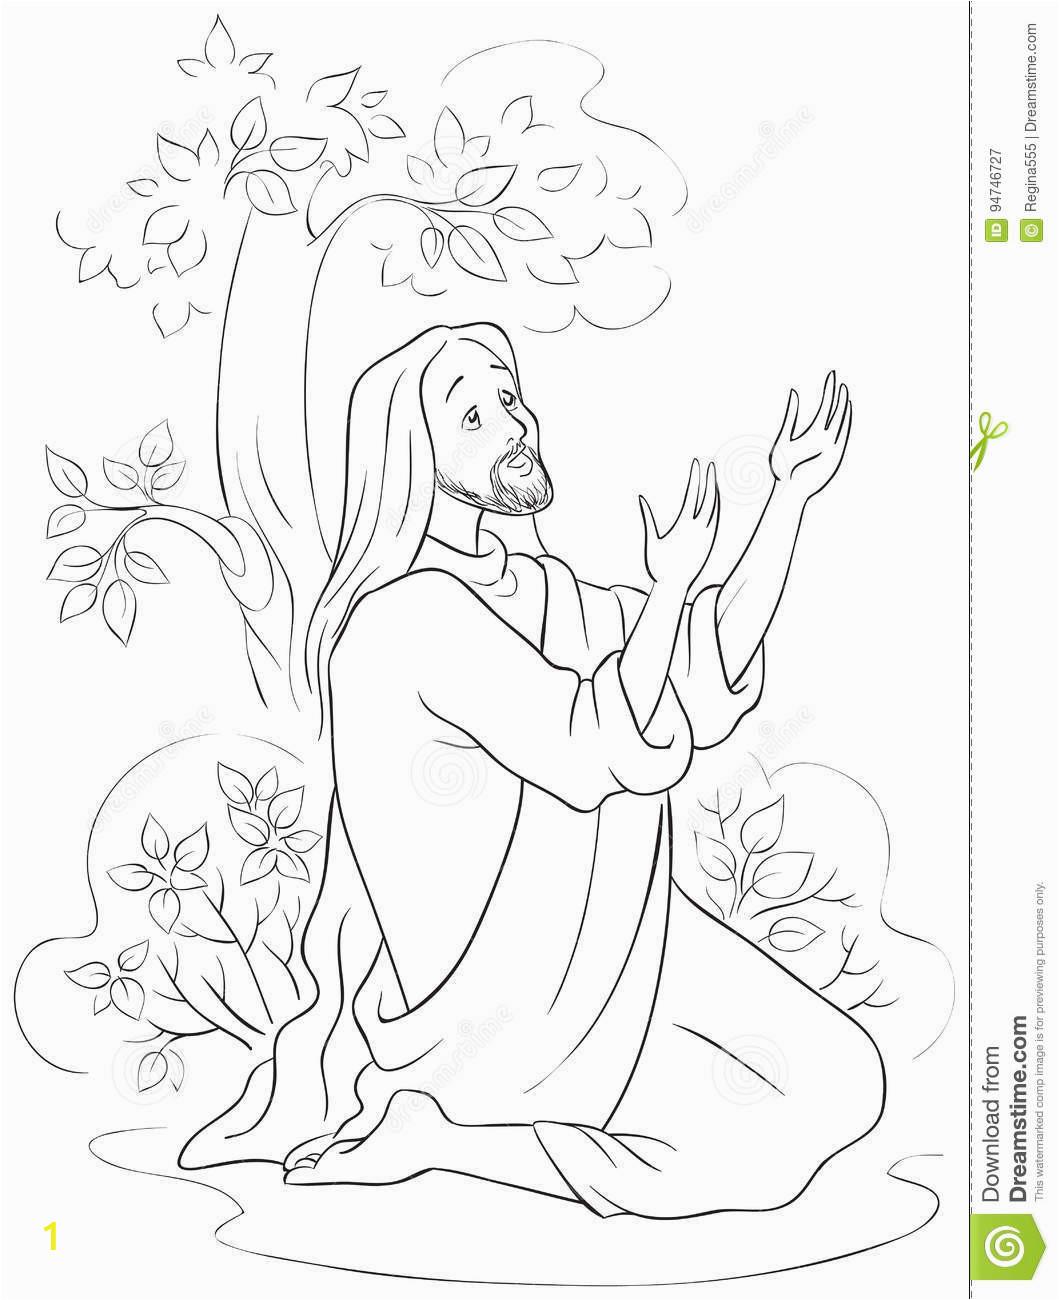 stock illustration prayer jesus hsemane garden coloring page scene night crucifixion vector christian cartoon black white image